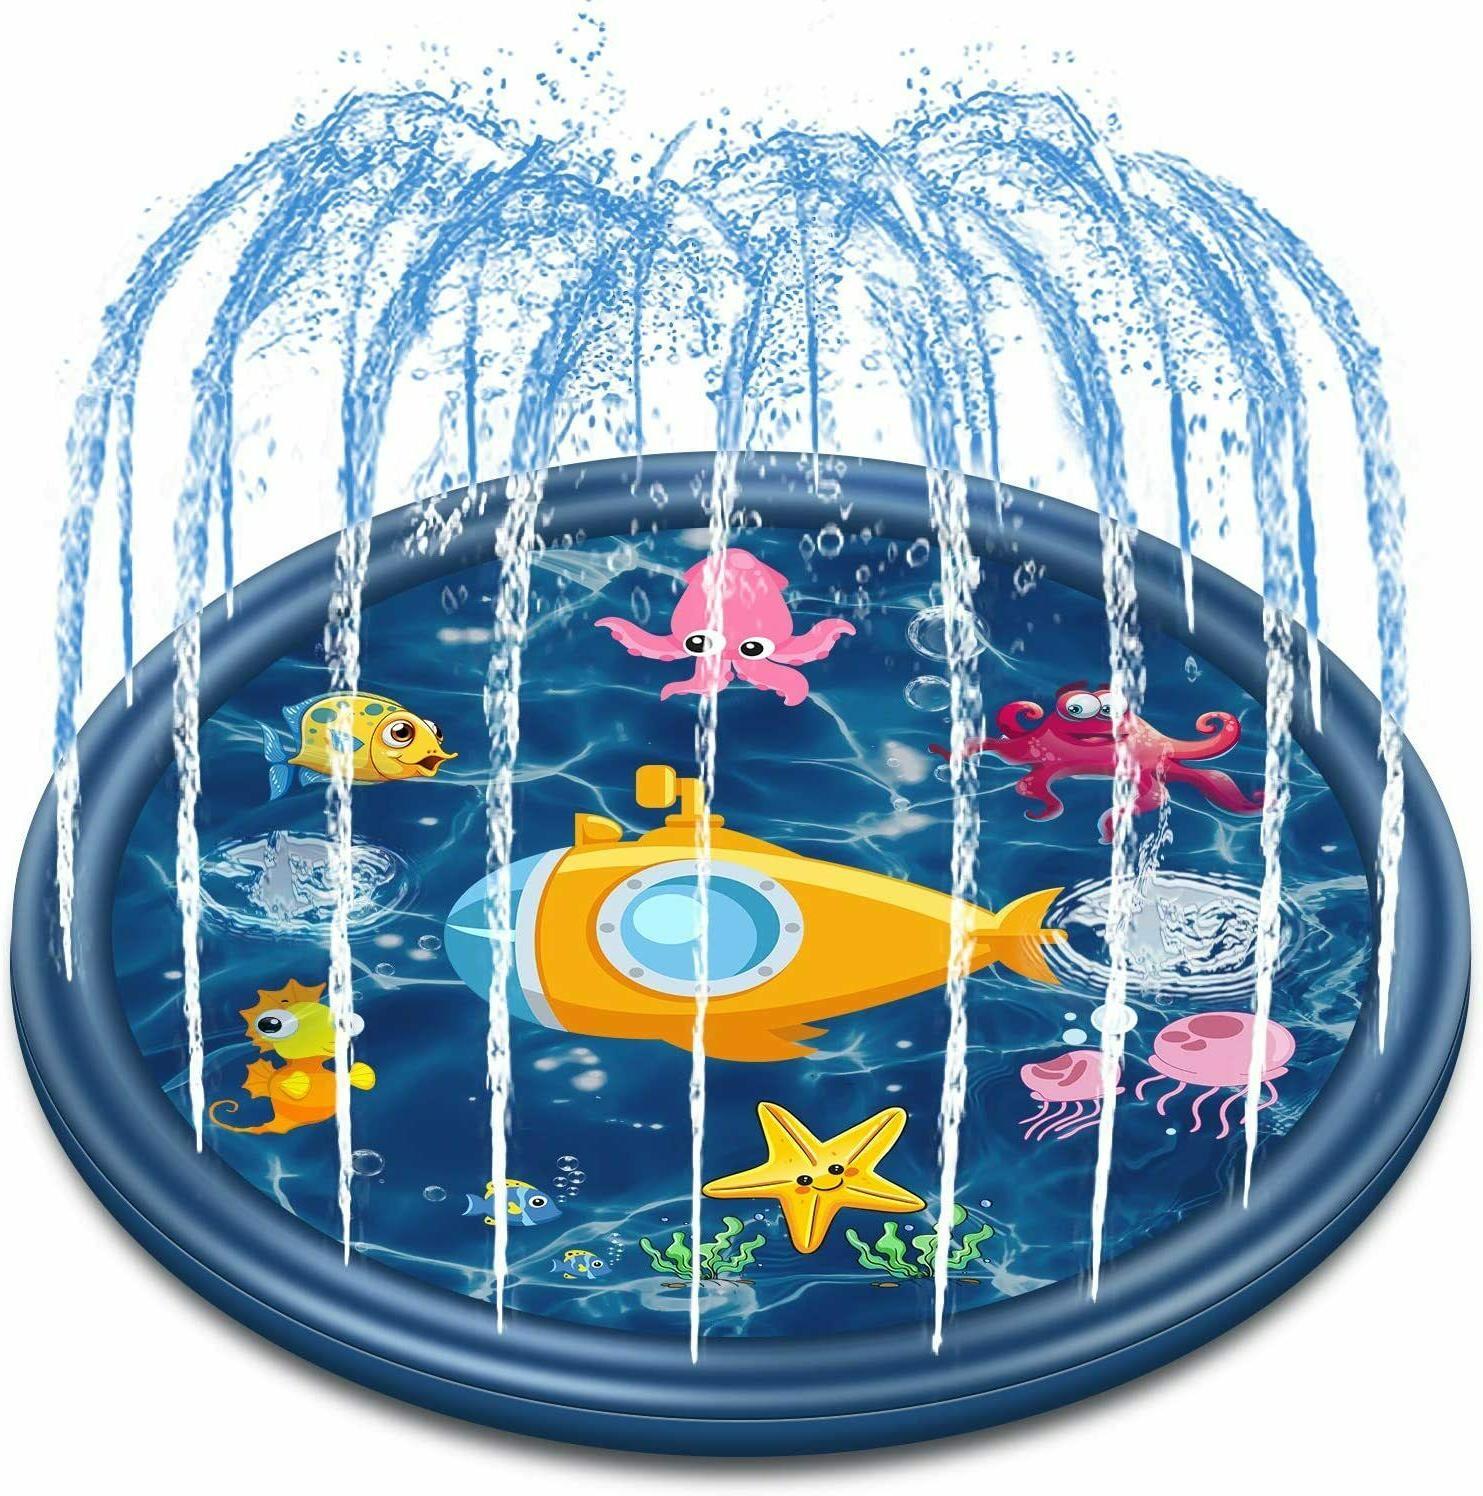 outdoor sprinkler water toys for kids